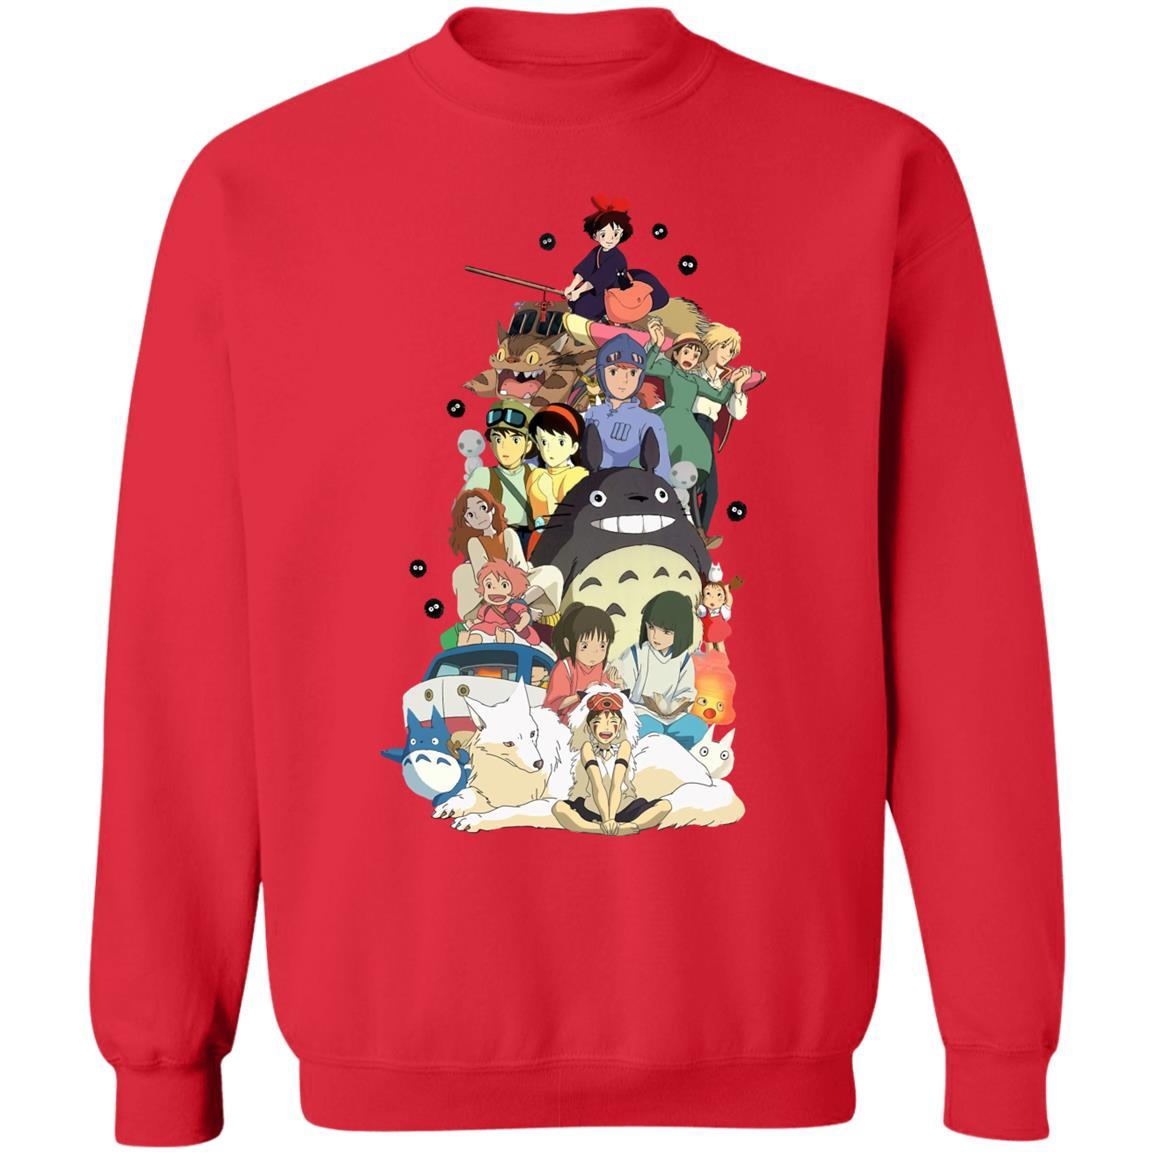 Ghibli Movie Characters Compilation Sweatshirt